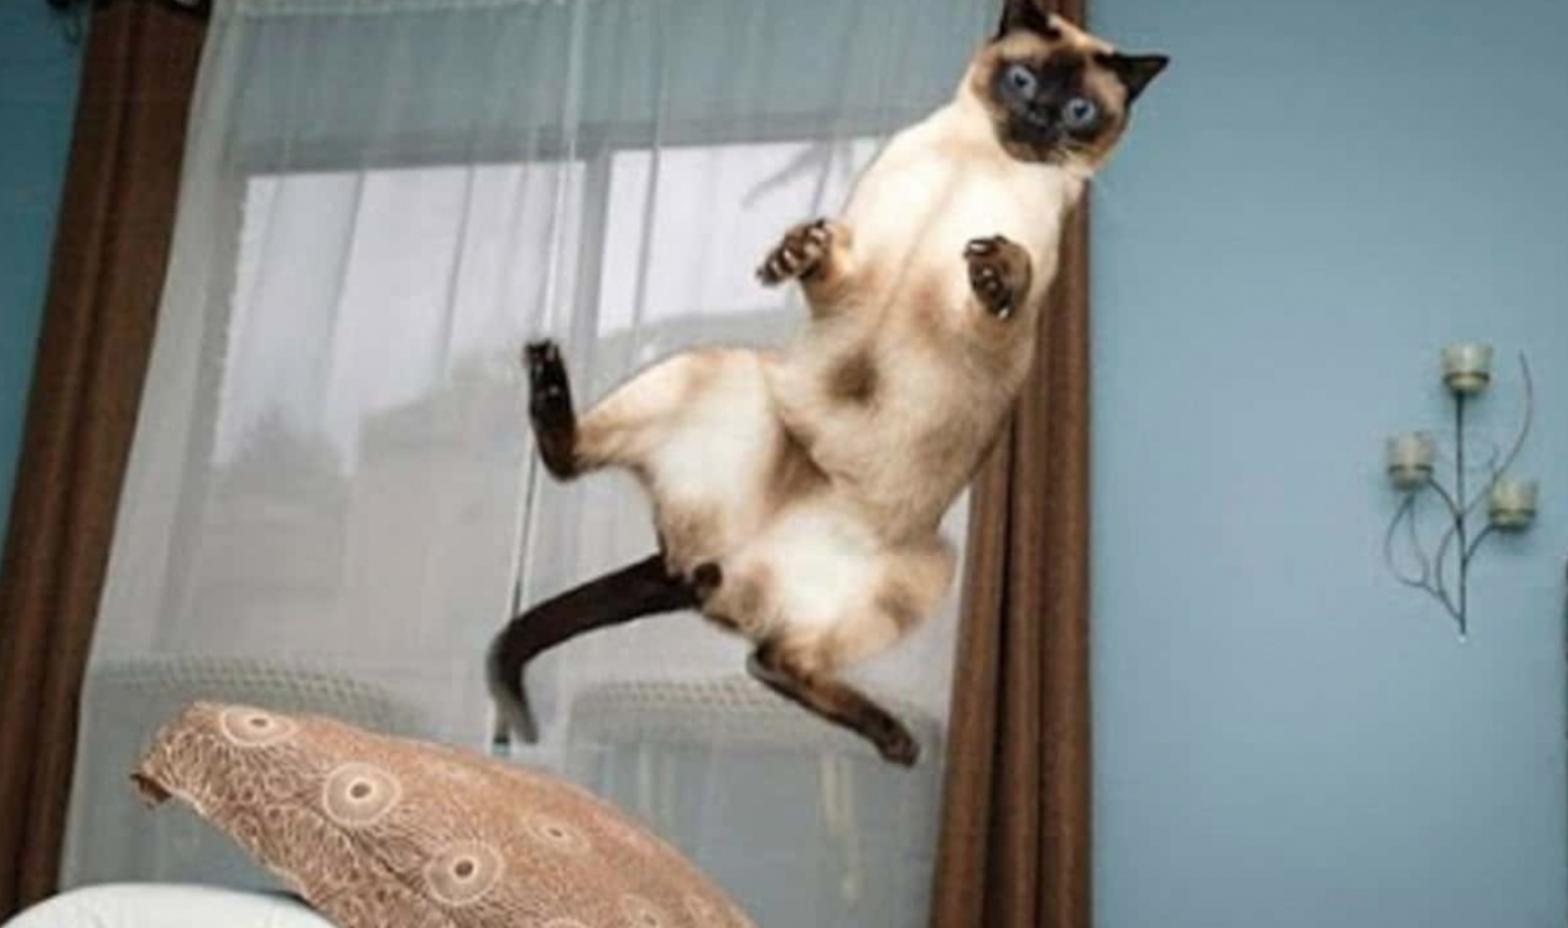 gatti buffi video divertente di gatti - Libertyfood.it